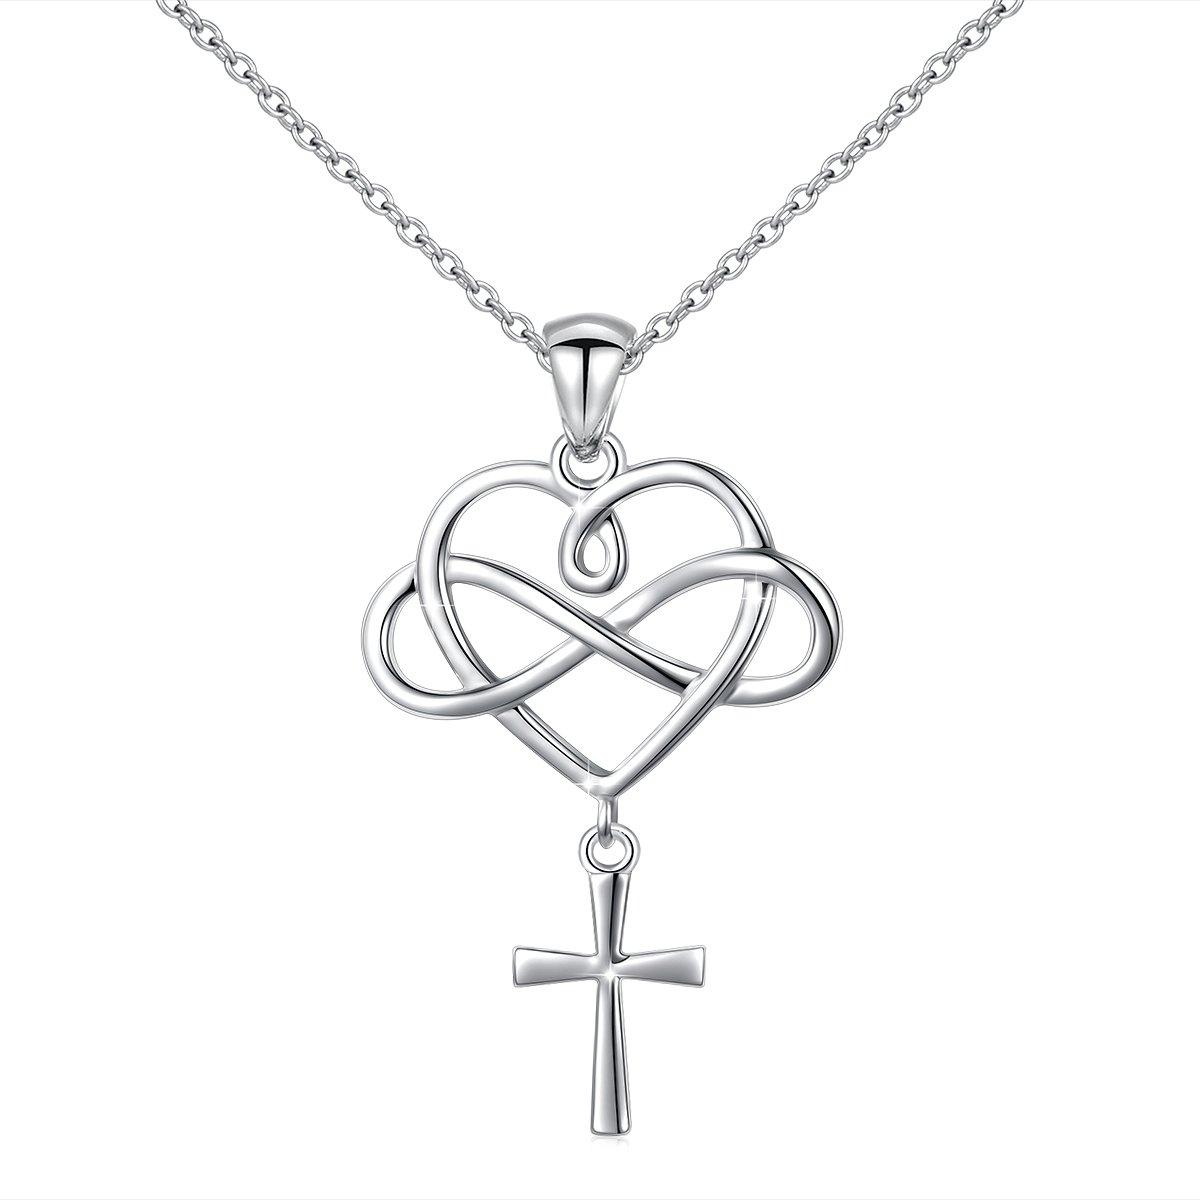 LINLIN FINE JEWELRY Cross Necklace 925 Sterling Silver Infinity Loving Heart Criss Cross Pendant Necklace for Women, 18 inch